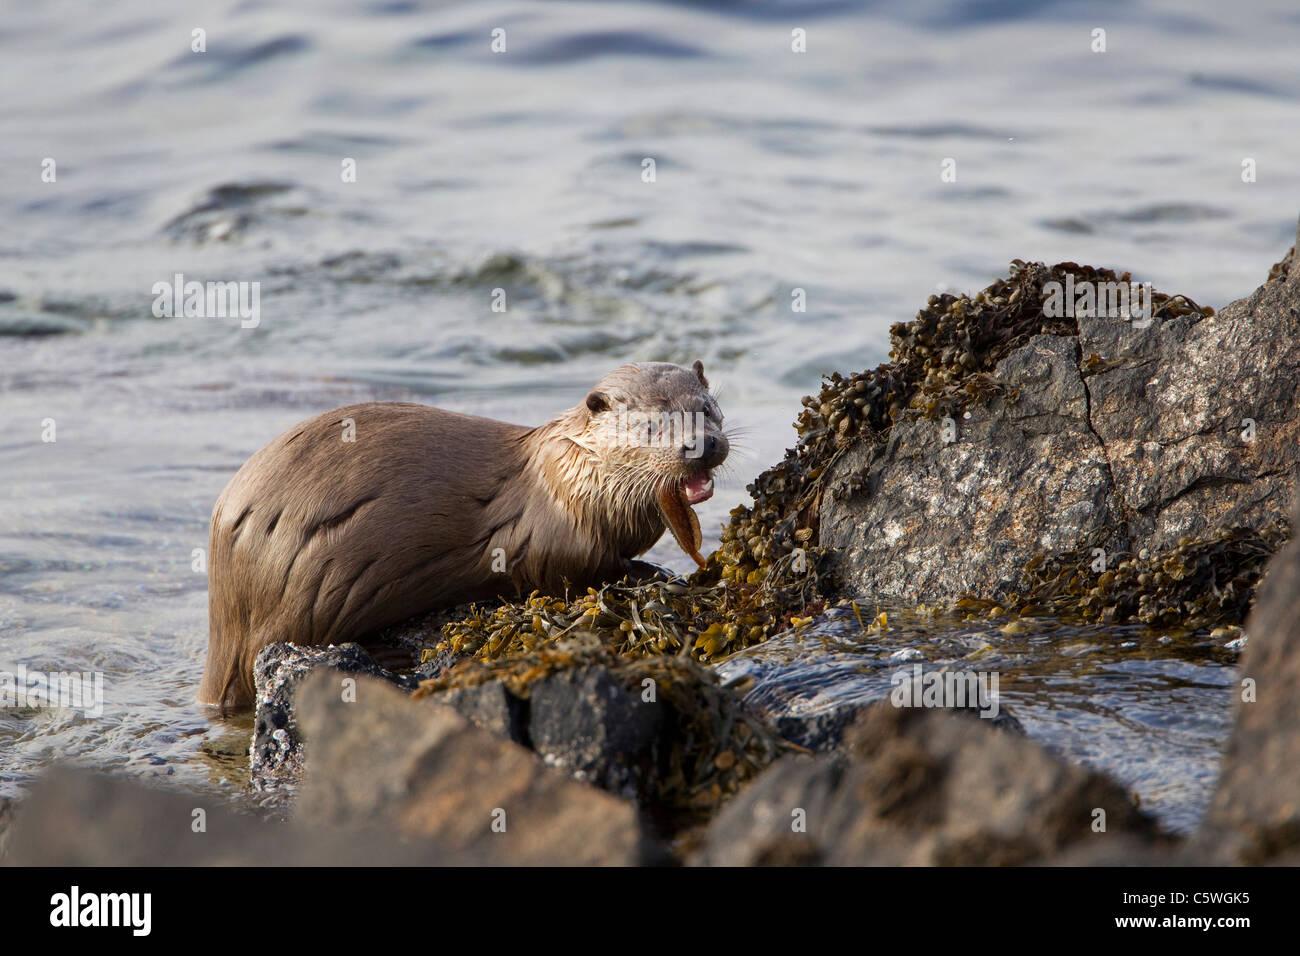 European River Otter (Lutra lutra) feeding on a Rockling on rocky coast. Shetland, Scotland, Great Britain. Stock Photo